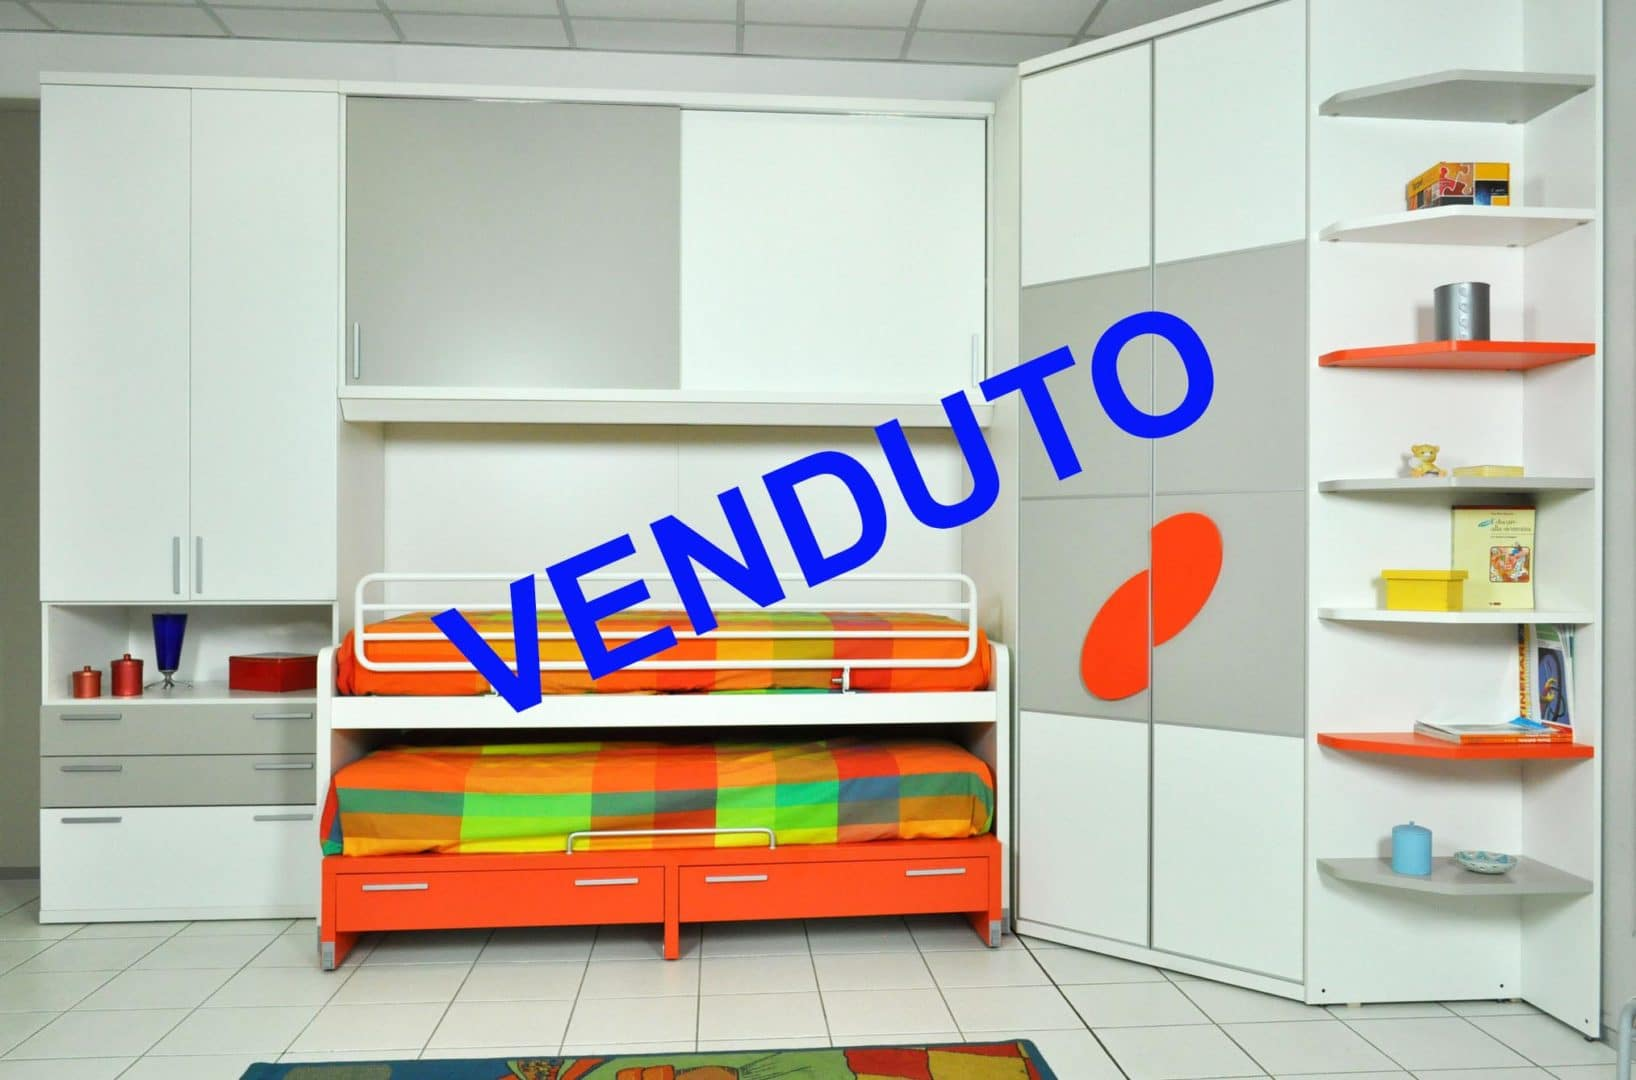 https://www.arredalcasa.it/wp-content/uploads/2015/10/doimo-ponte-VENDUTO.jpg